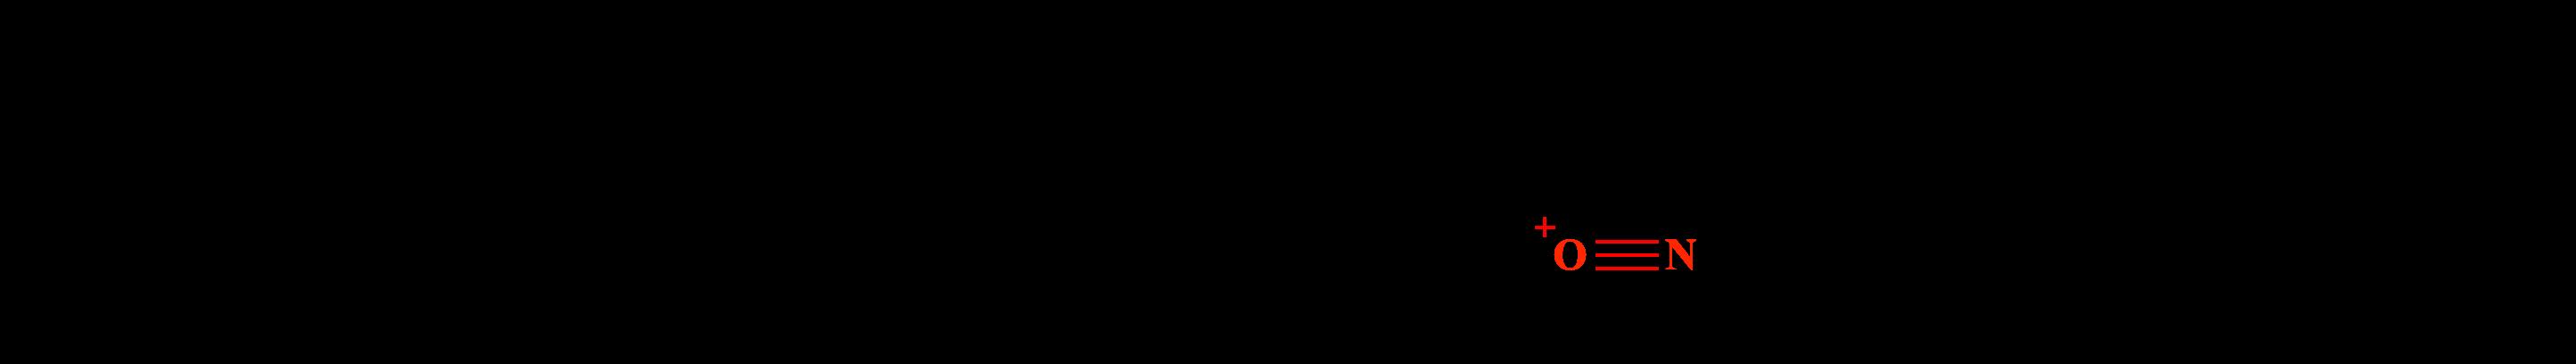 Illustrated Glossary of Organic Chemistry - Nitrosonium cation